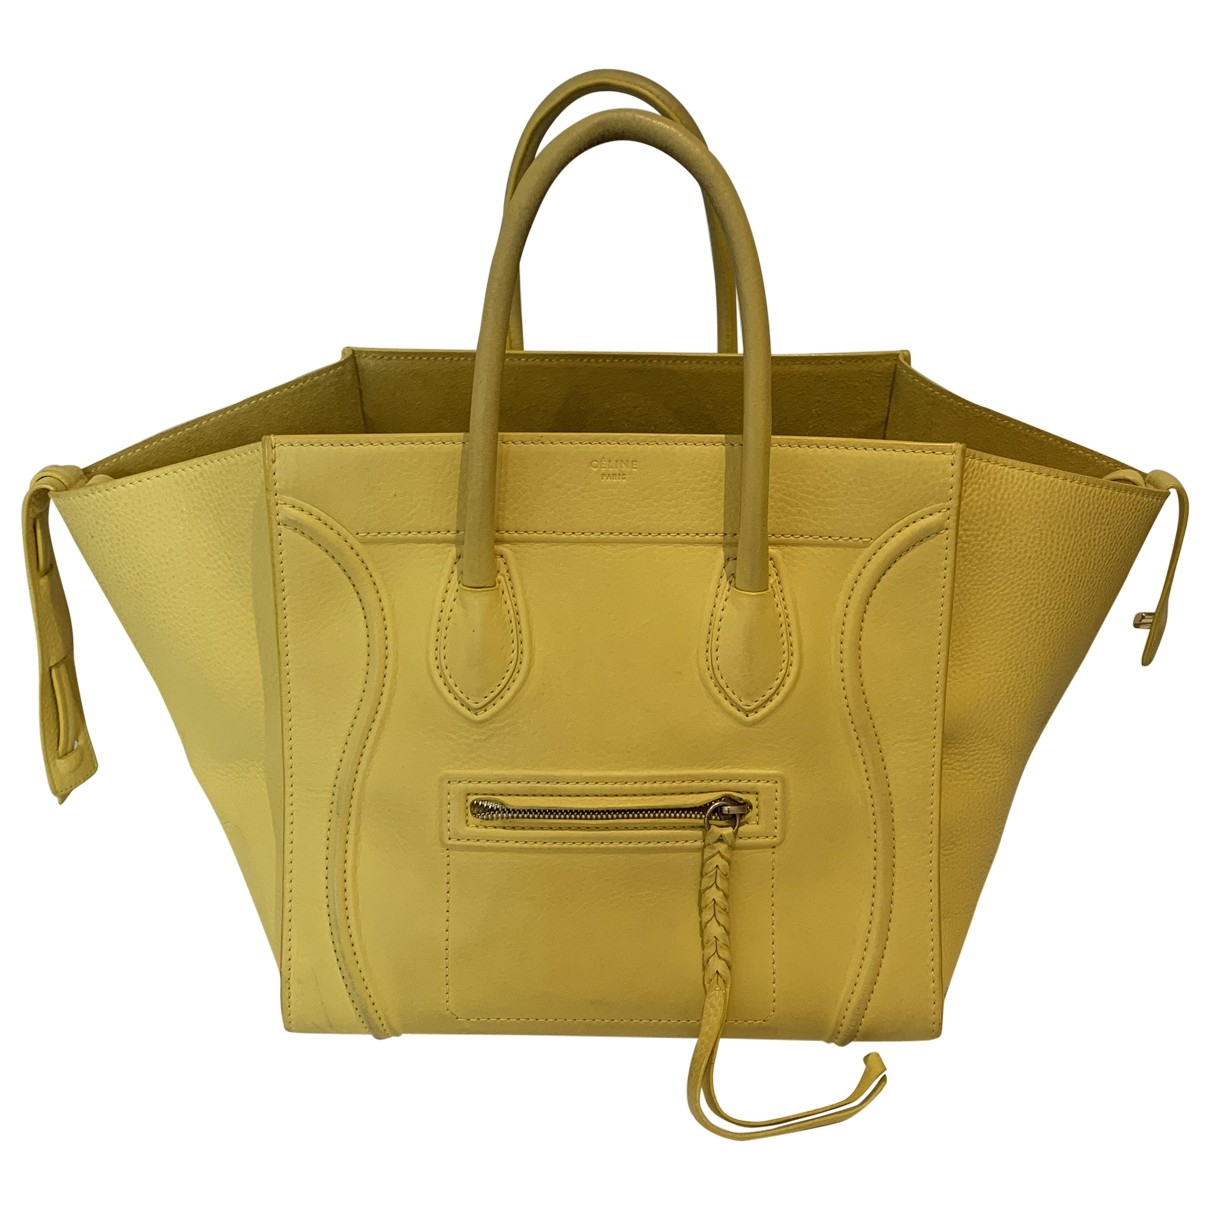 Celine - Sac a main Luggage Phantom pour femme en cuir - jaune